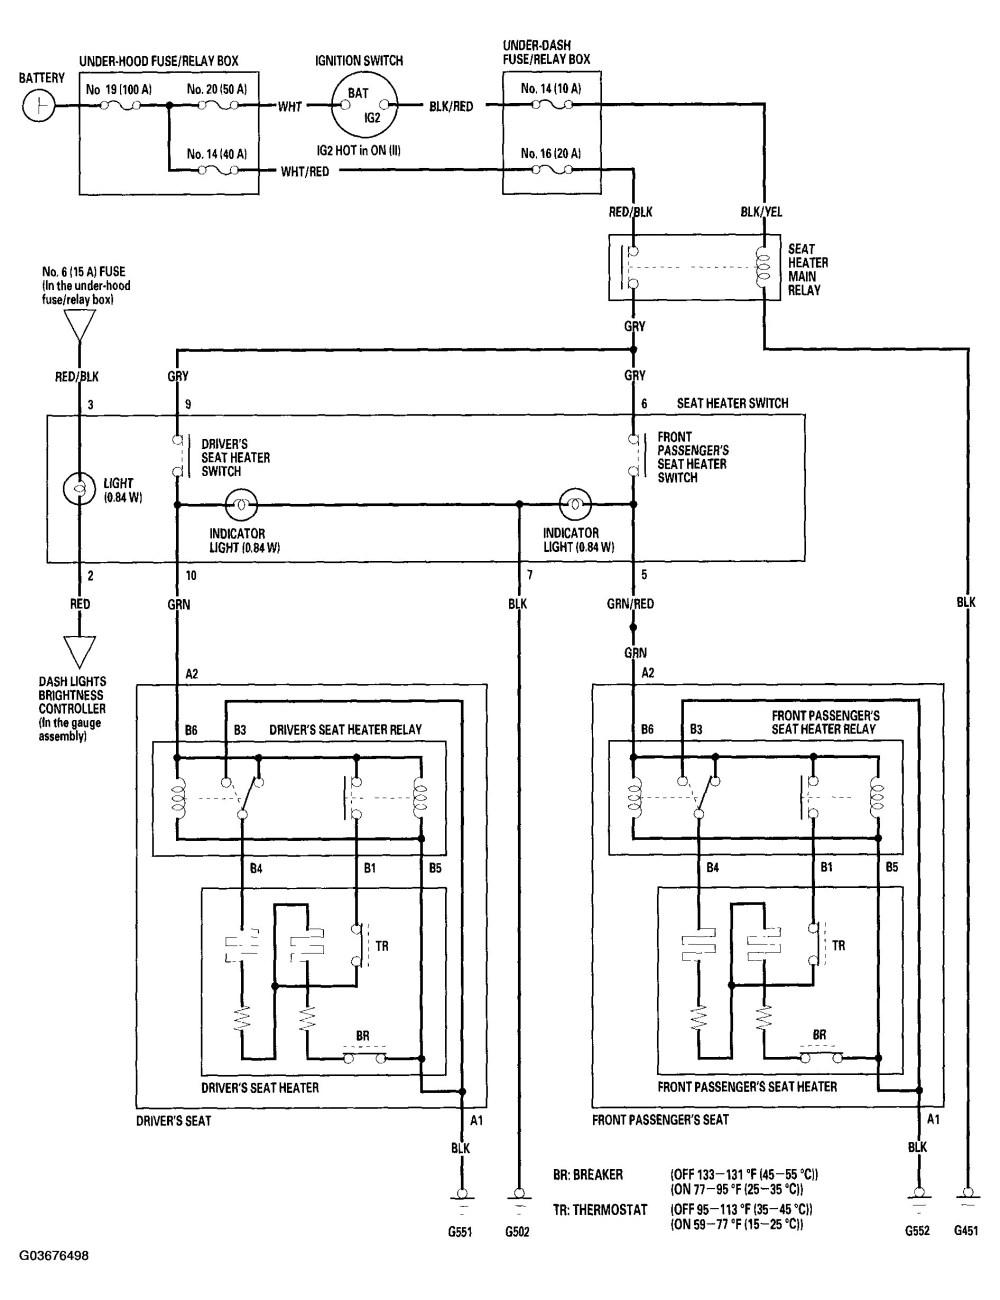 medium resolution of 2004 honda accord engine diagram 1994 honda accord engine diagram cr v fuse box diagram besides